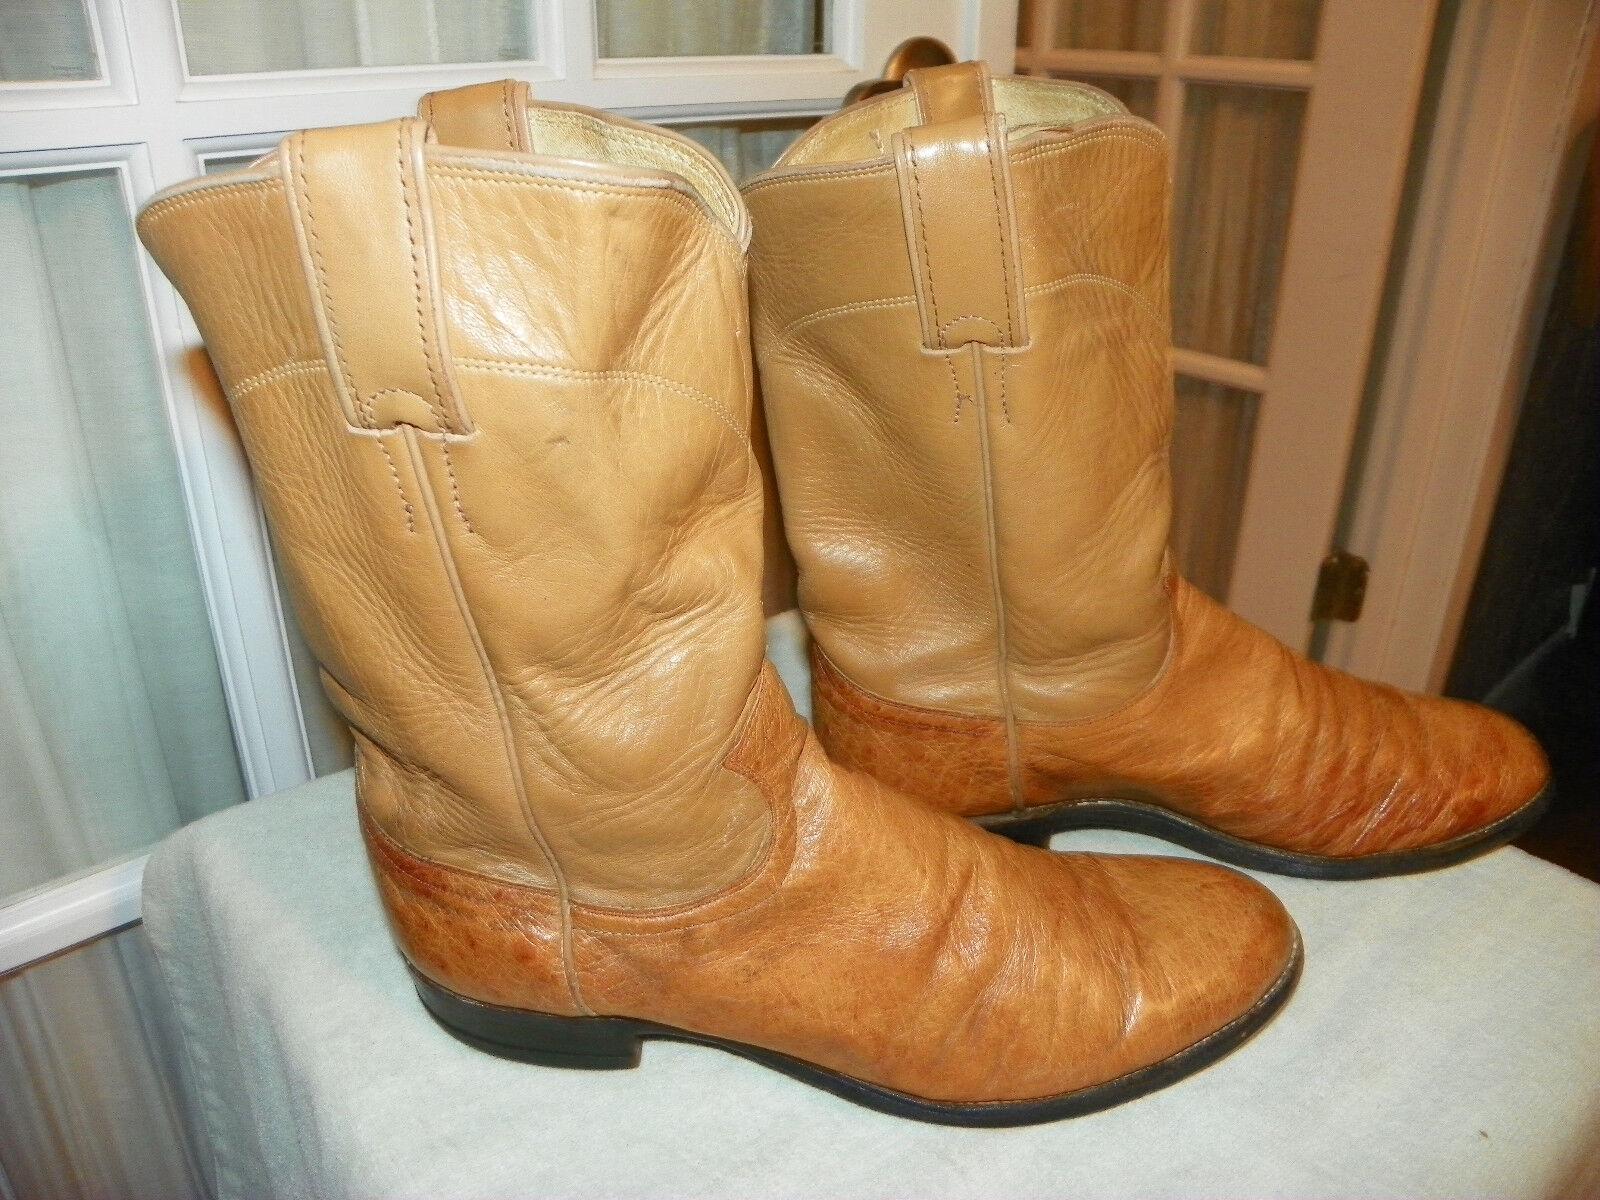 Justin 3022 Uomo Smooth Ostrich Roper Cowboy Western Stivali size 8.5 B narrow USA